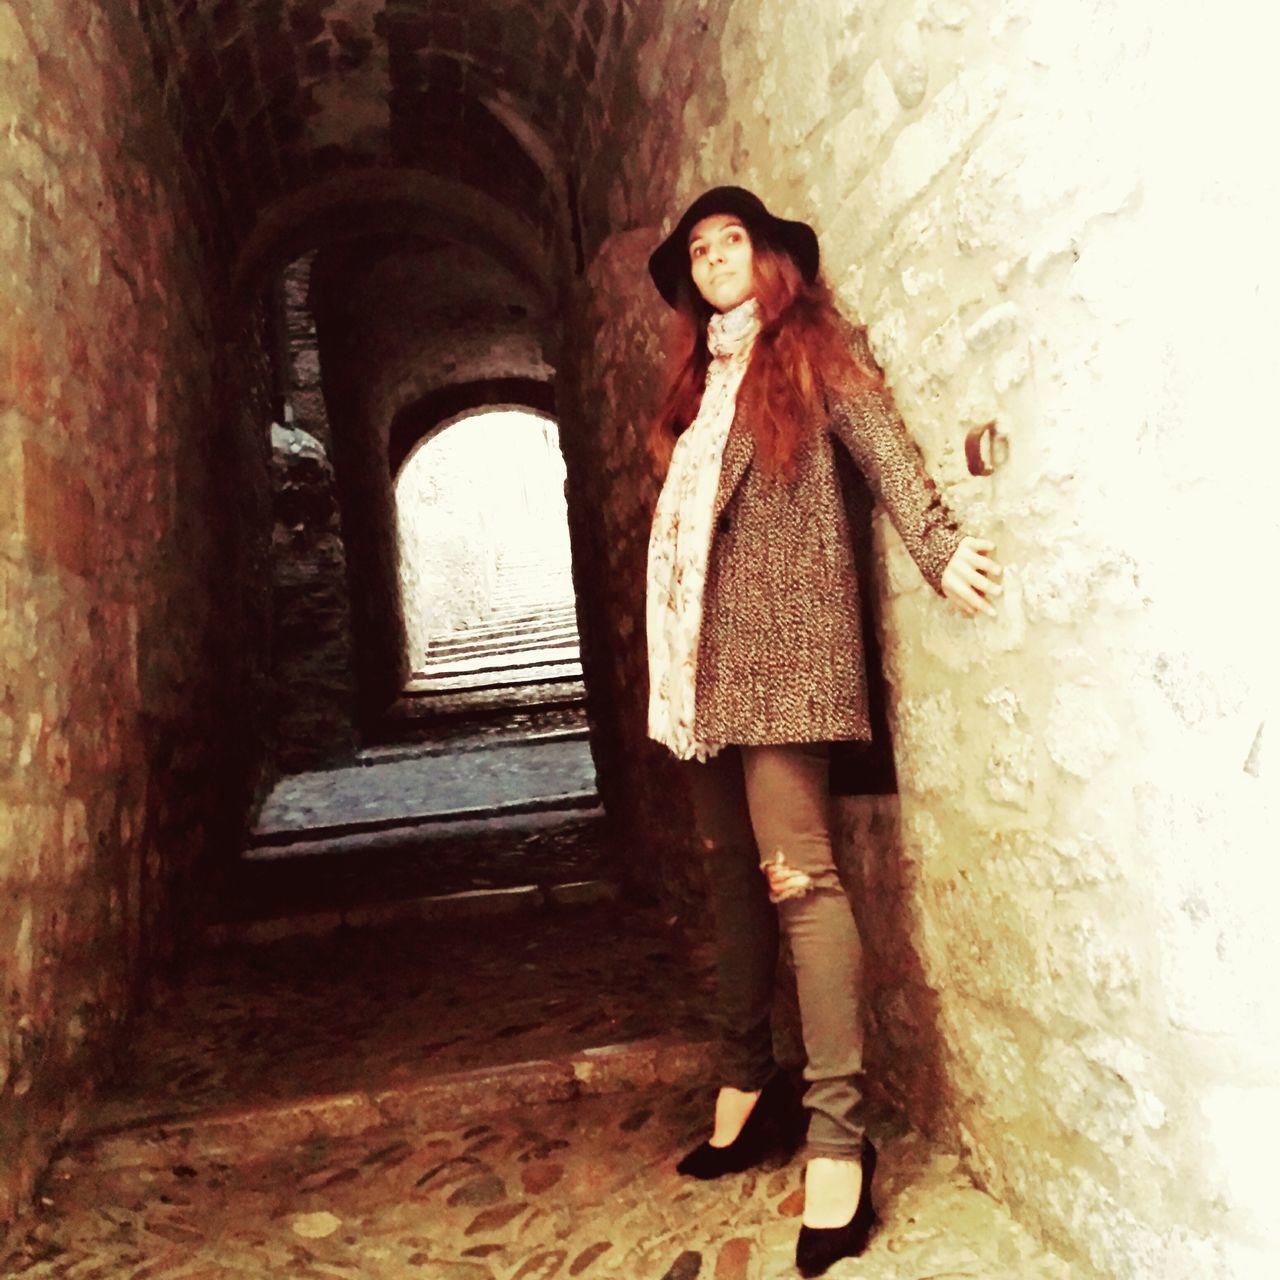 Gironamenamora Gironastreetphotography Catalunyaexperience Medieval Architecture Me Street Photography Color Photography